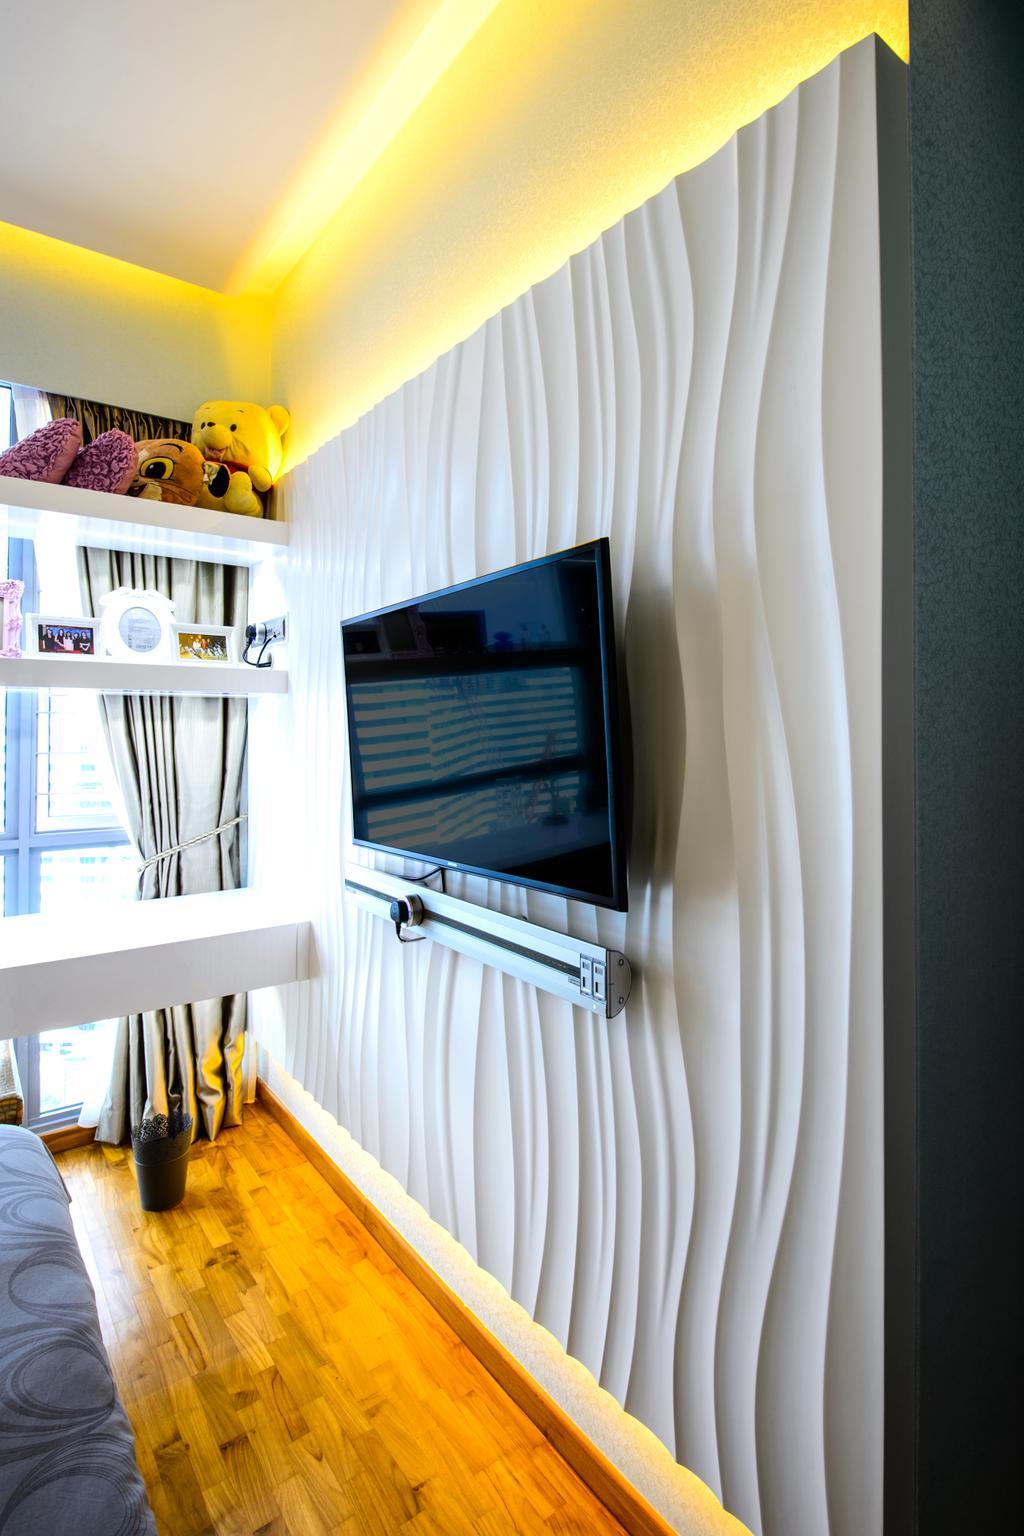 Eclectic, Condo, Bedroom, A Treasure Trove, Interior Designer, Hue Concept Interior Design, Tv Mount On Wall, Eubiq, Track System, Concealed Lighting